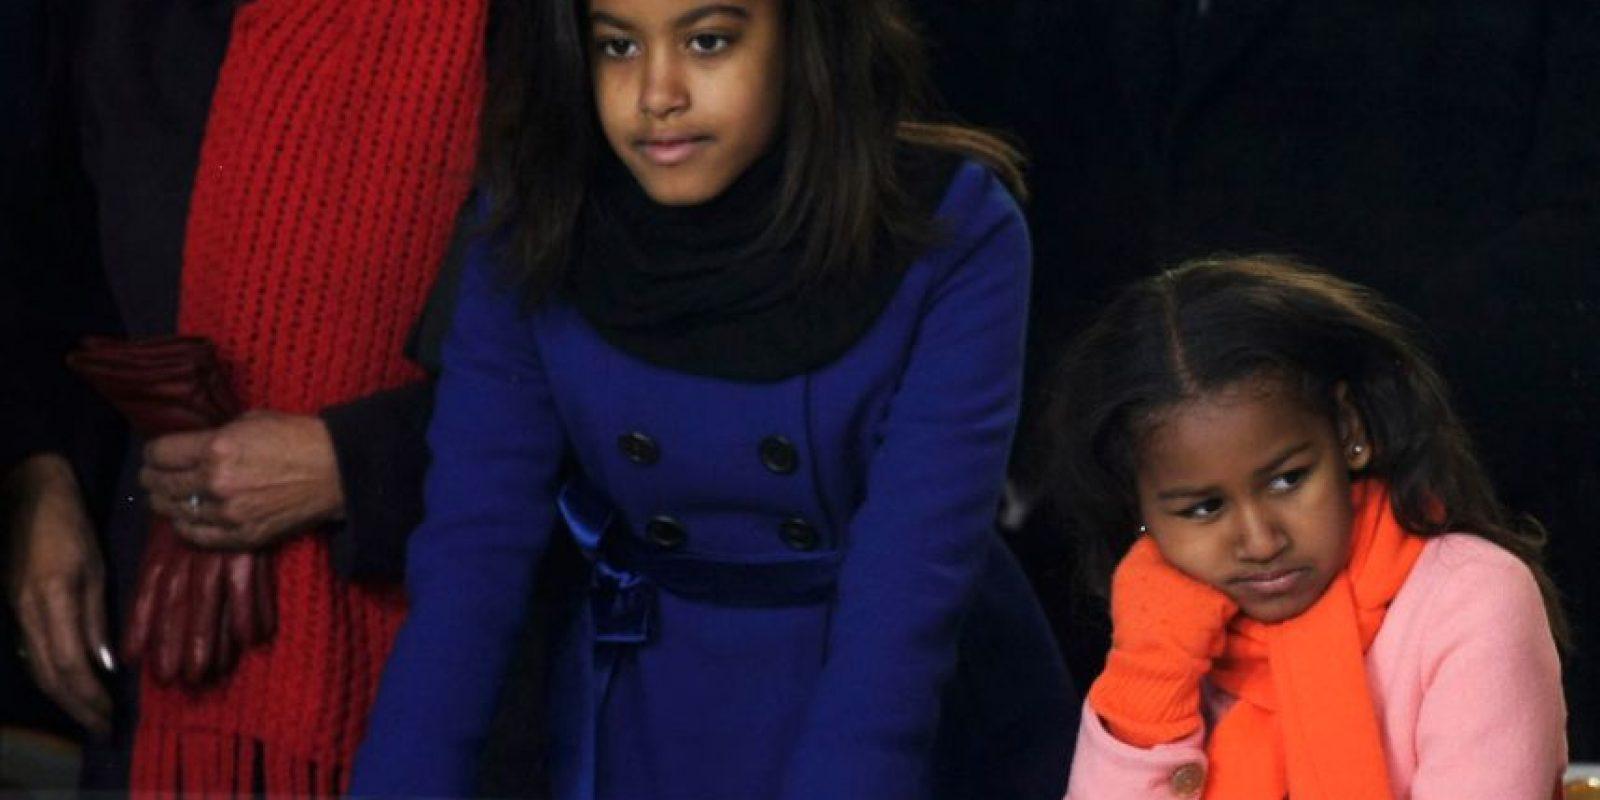 20 Images Of Sasha and malia inauguration pictures